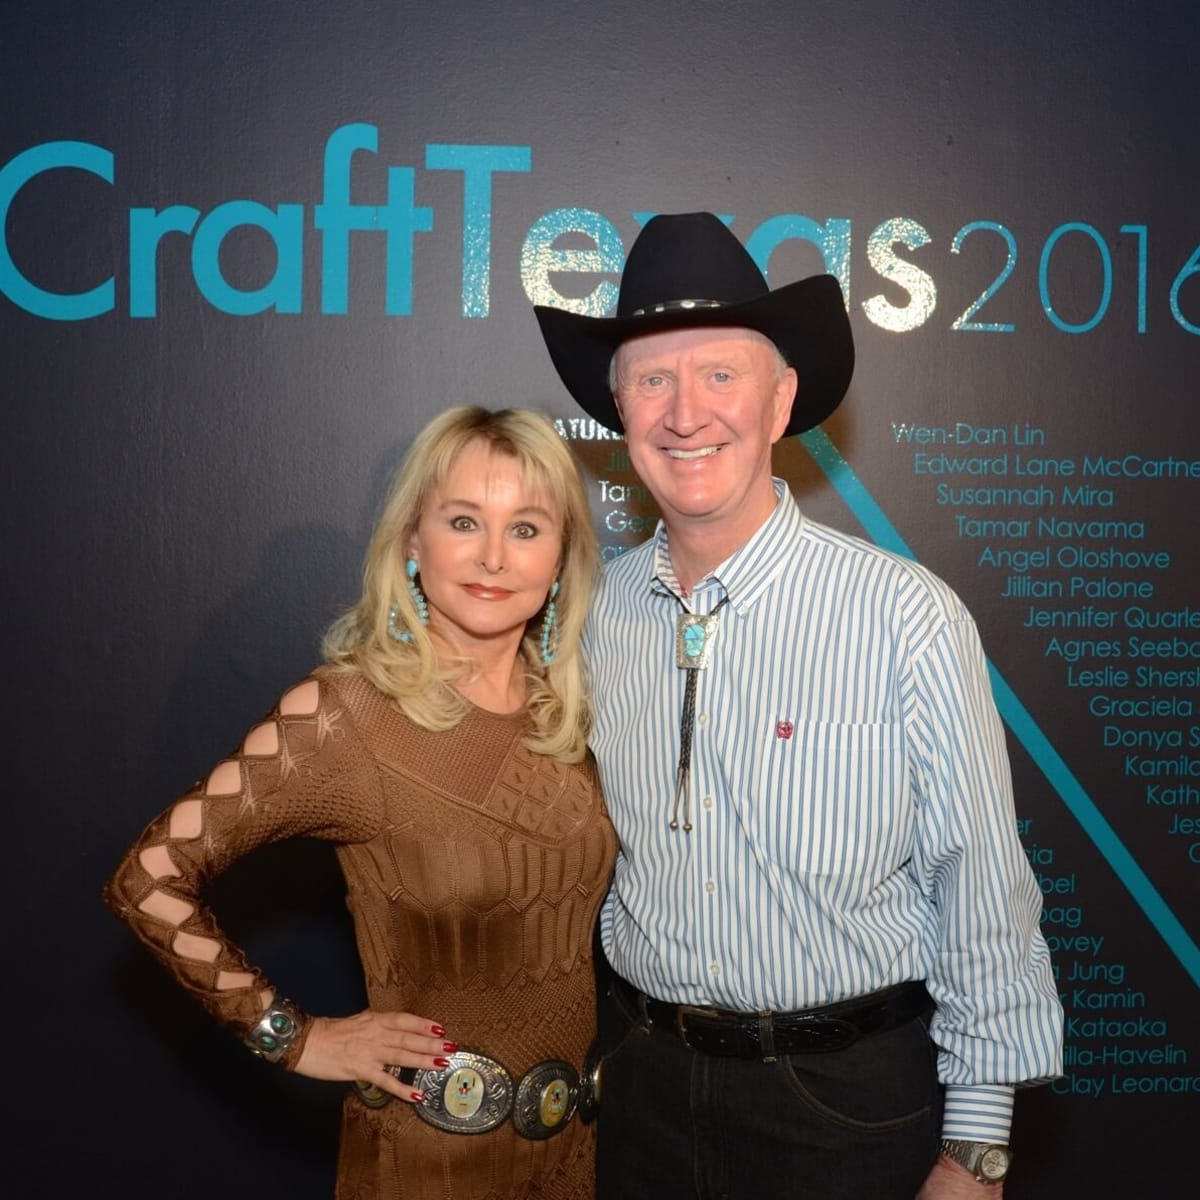 Craft Center Houston, 9/16, Michelle Hevrdejs, Frank Hevrdejs